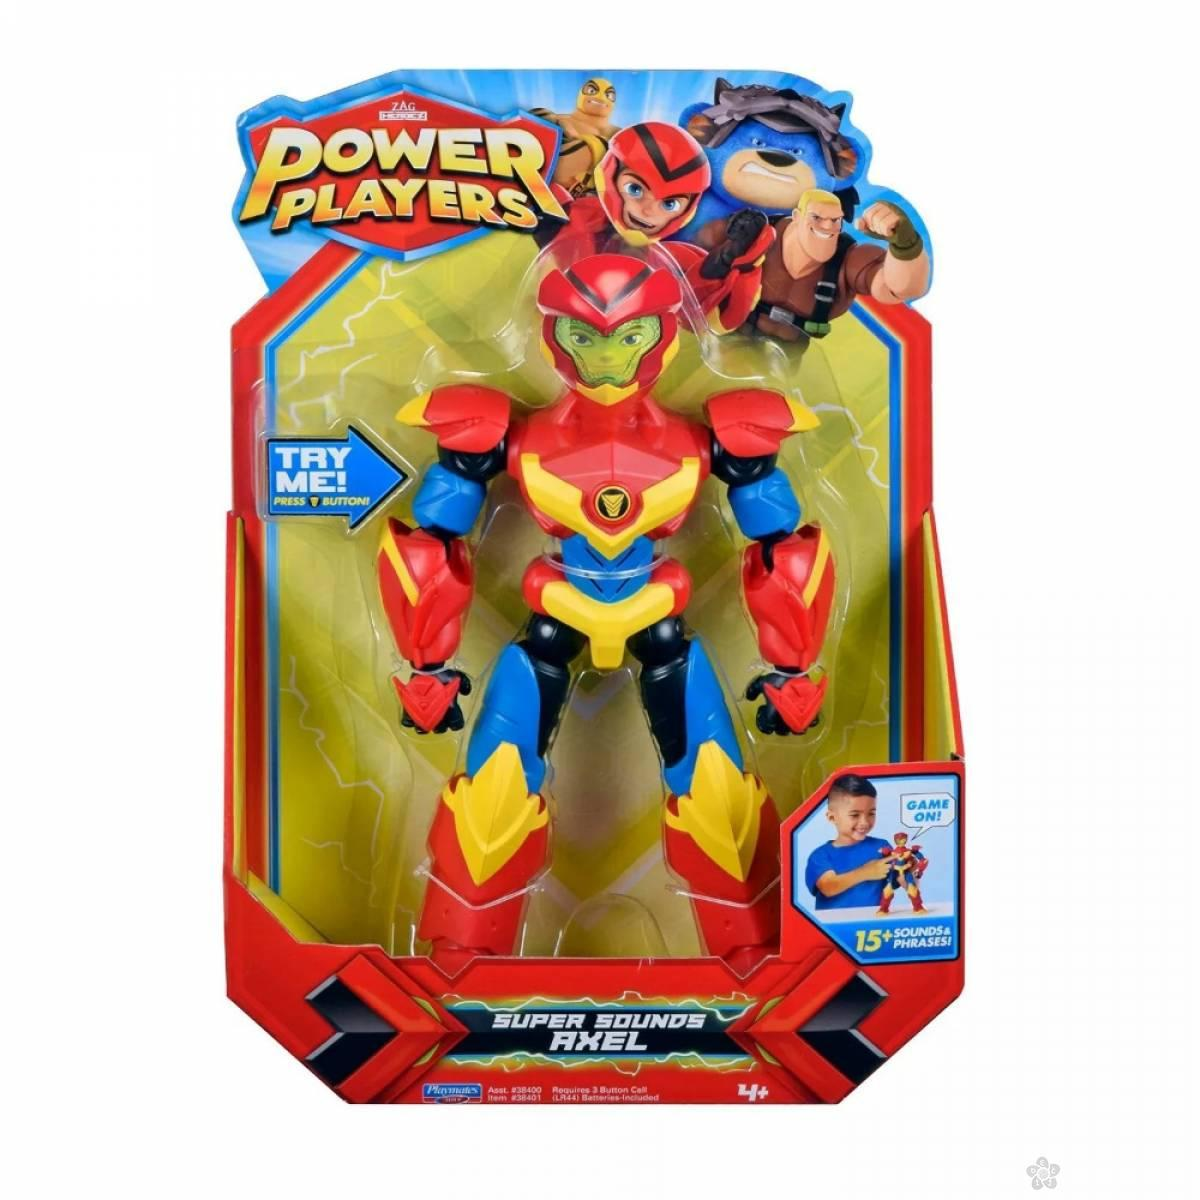 Akciona figrura velika Power Players Axel 38401